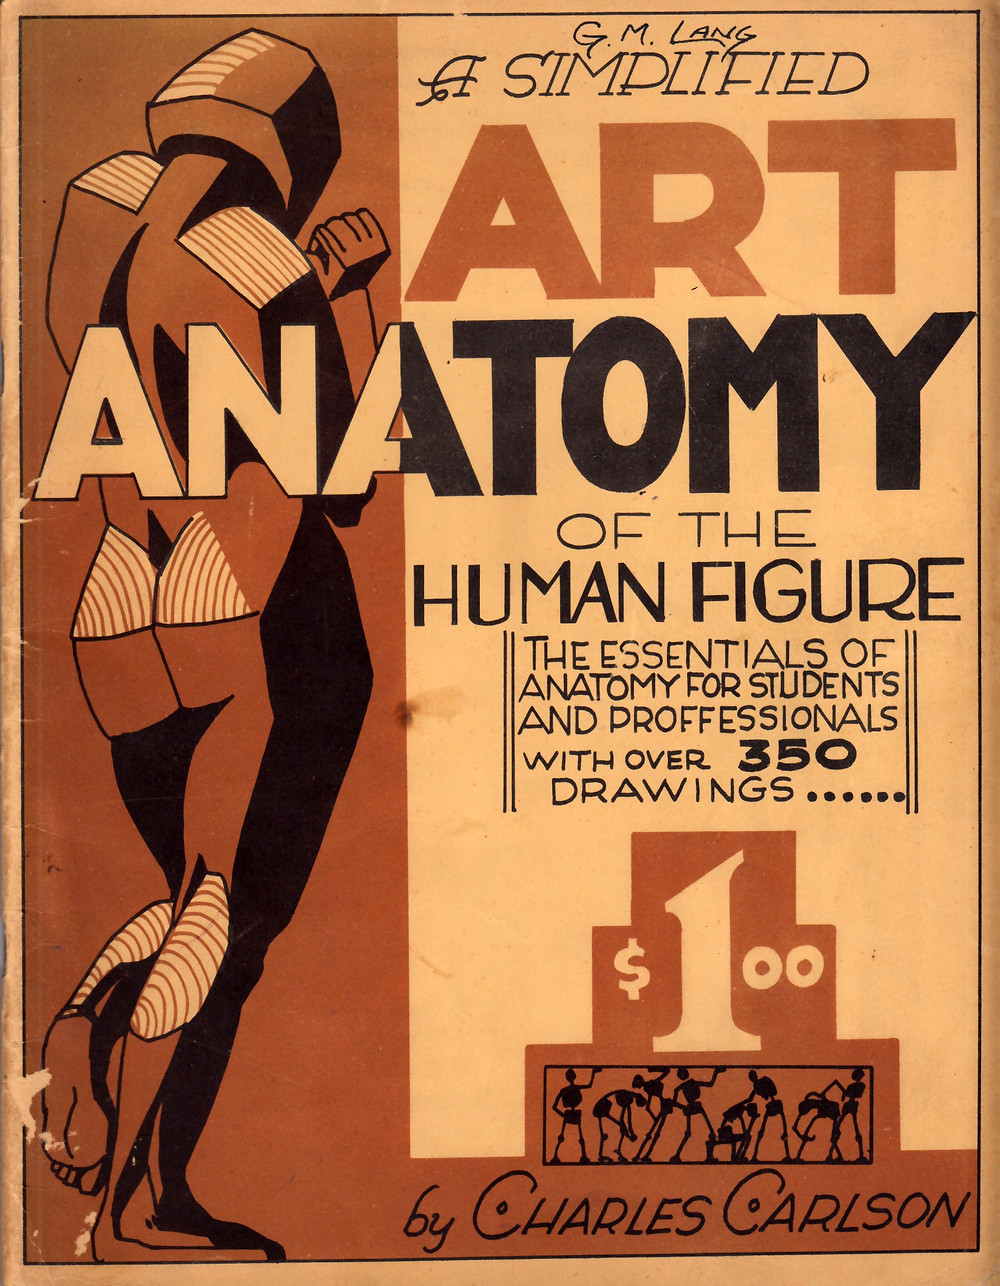 Charles Carlson a simplified art anatomy